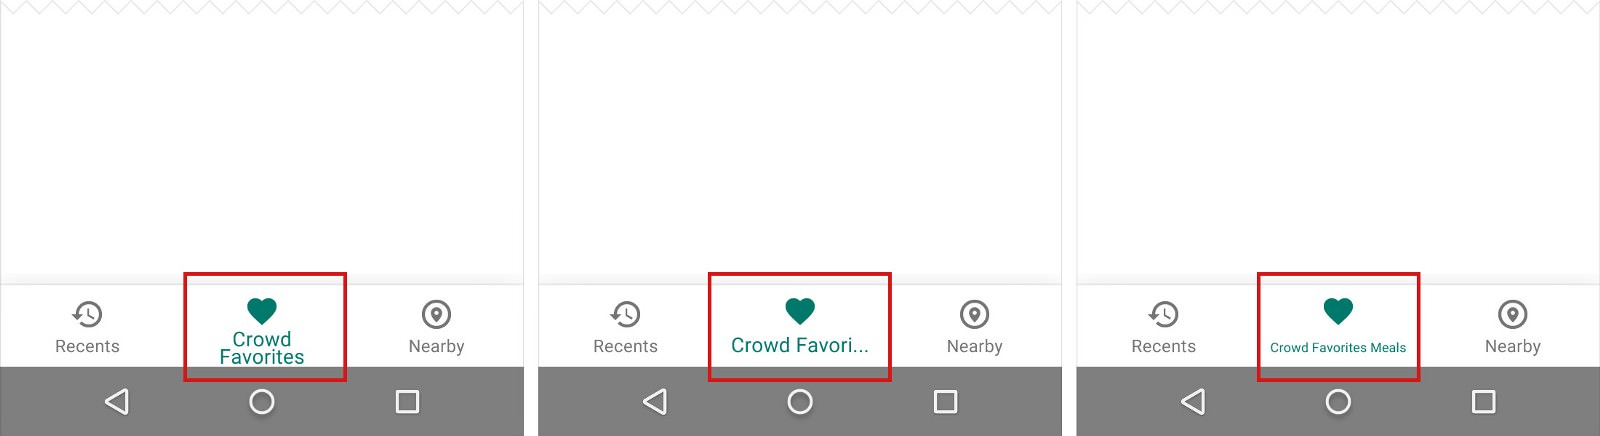 22 Best Apps And Mobile Images On Pinterest App Design45 best mobile